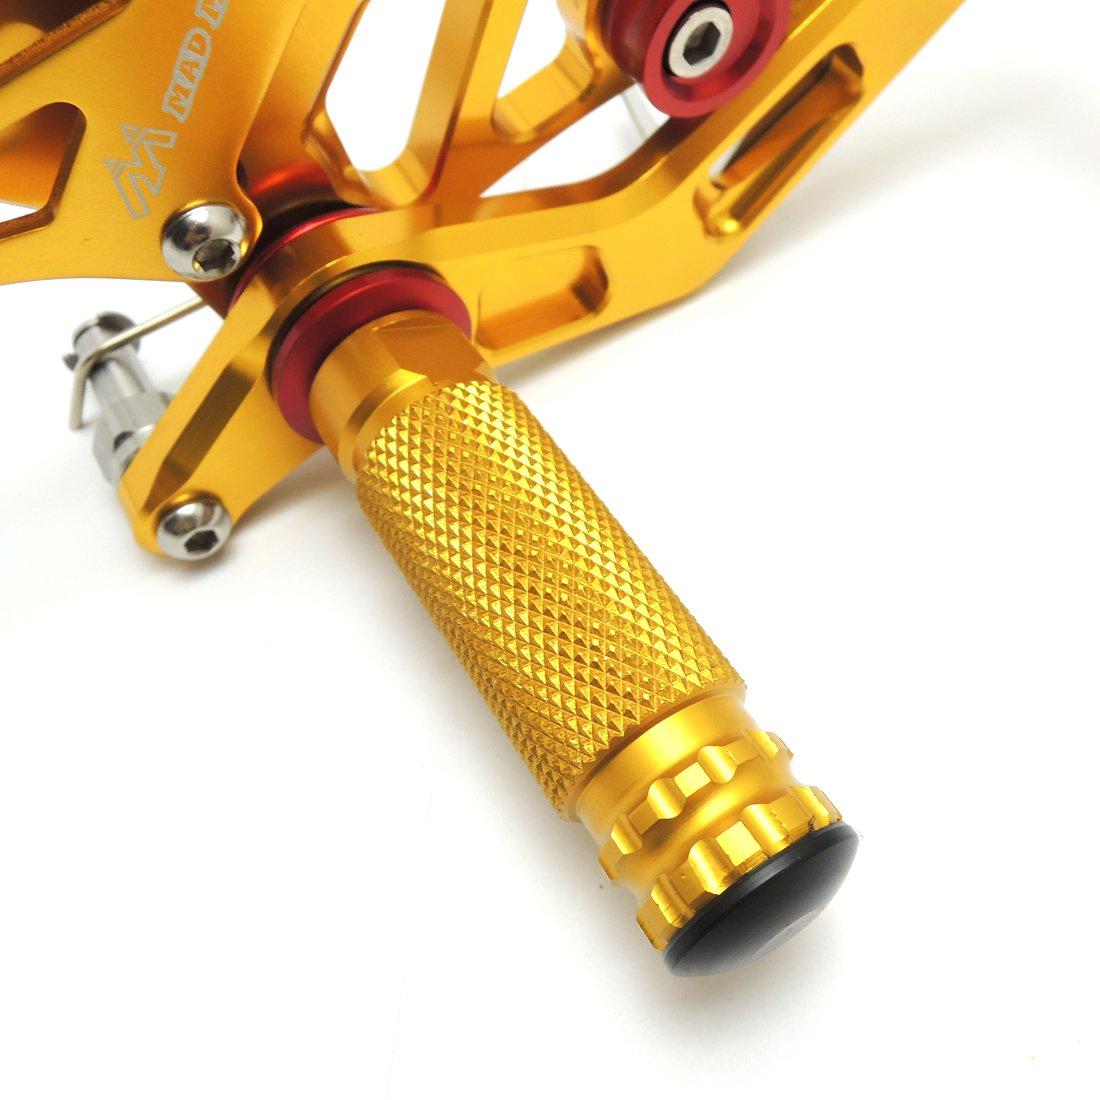 Estriberas Ajustables CNC Reposapi/és de Motocicleta para CBR1000RR CBR600RR 2003 2004 2005 2006 2007